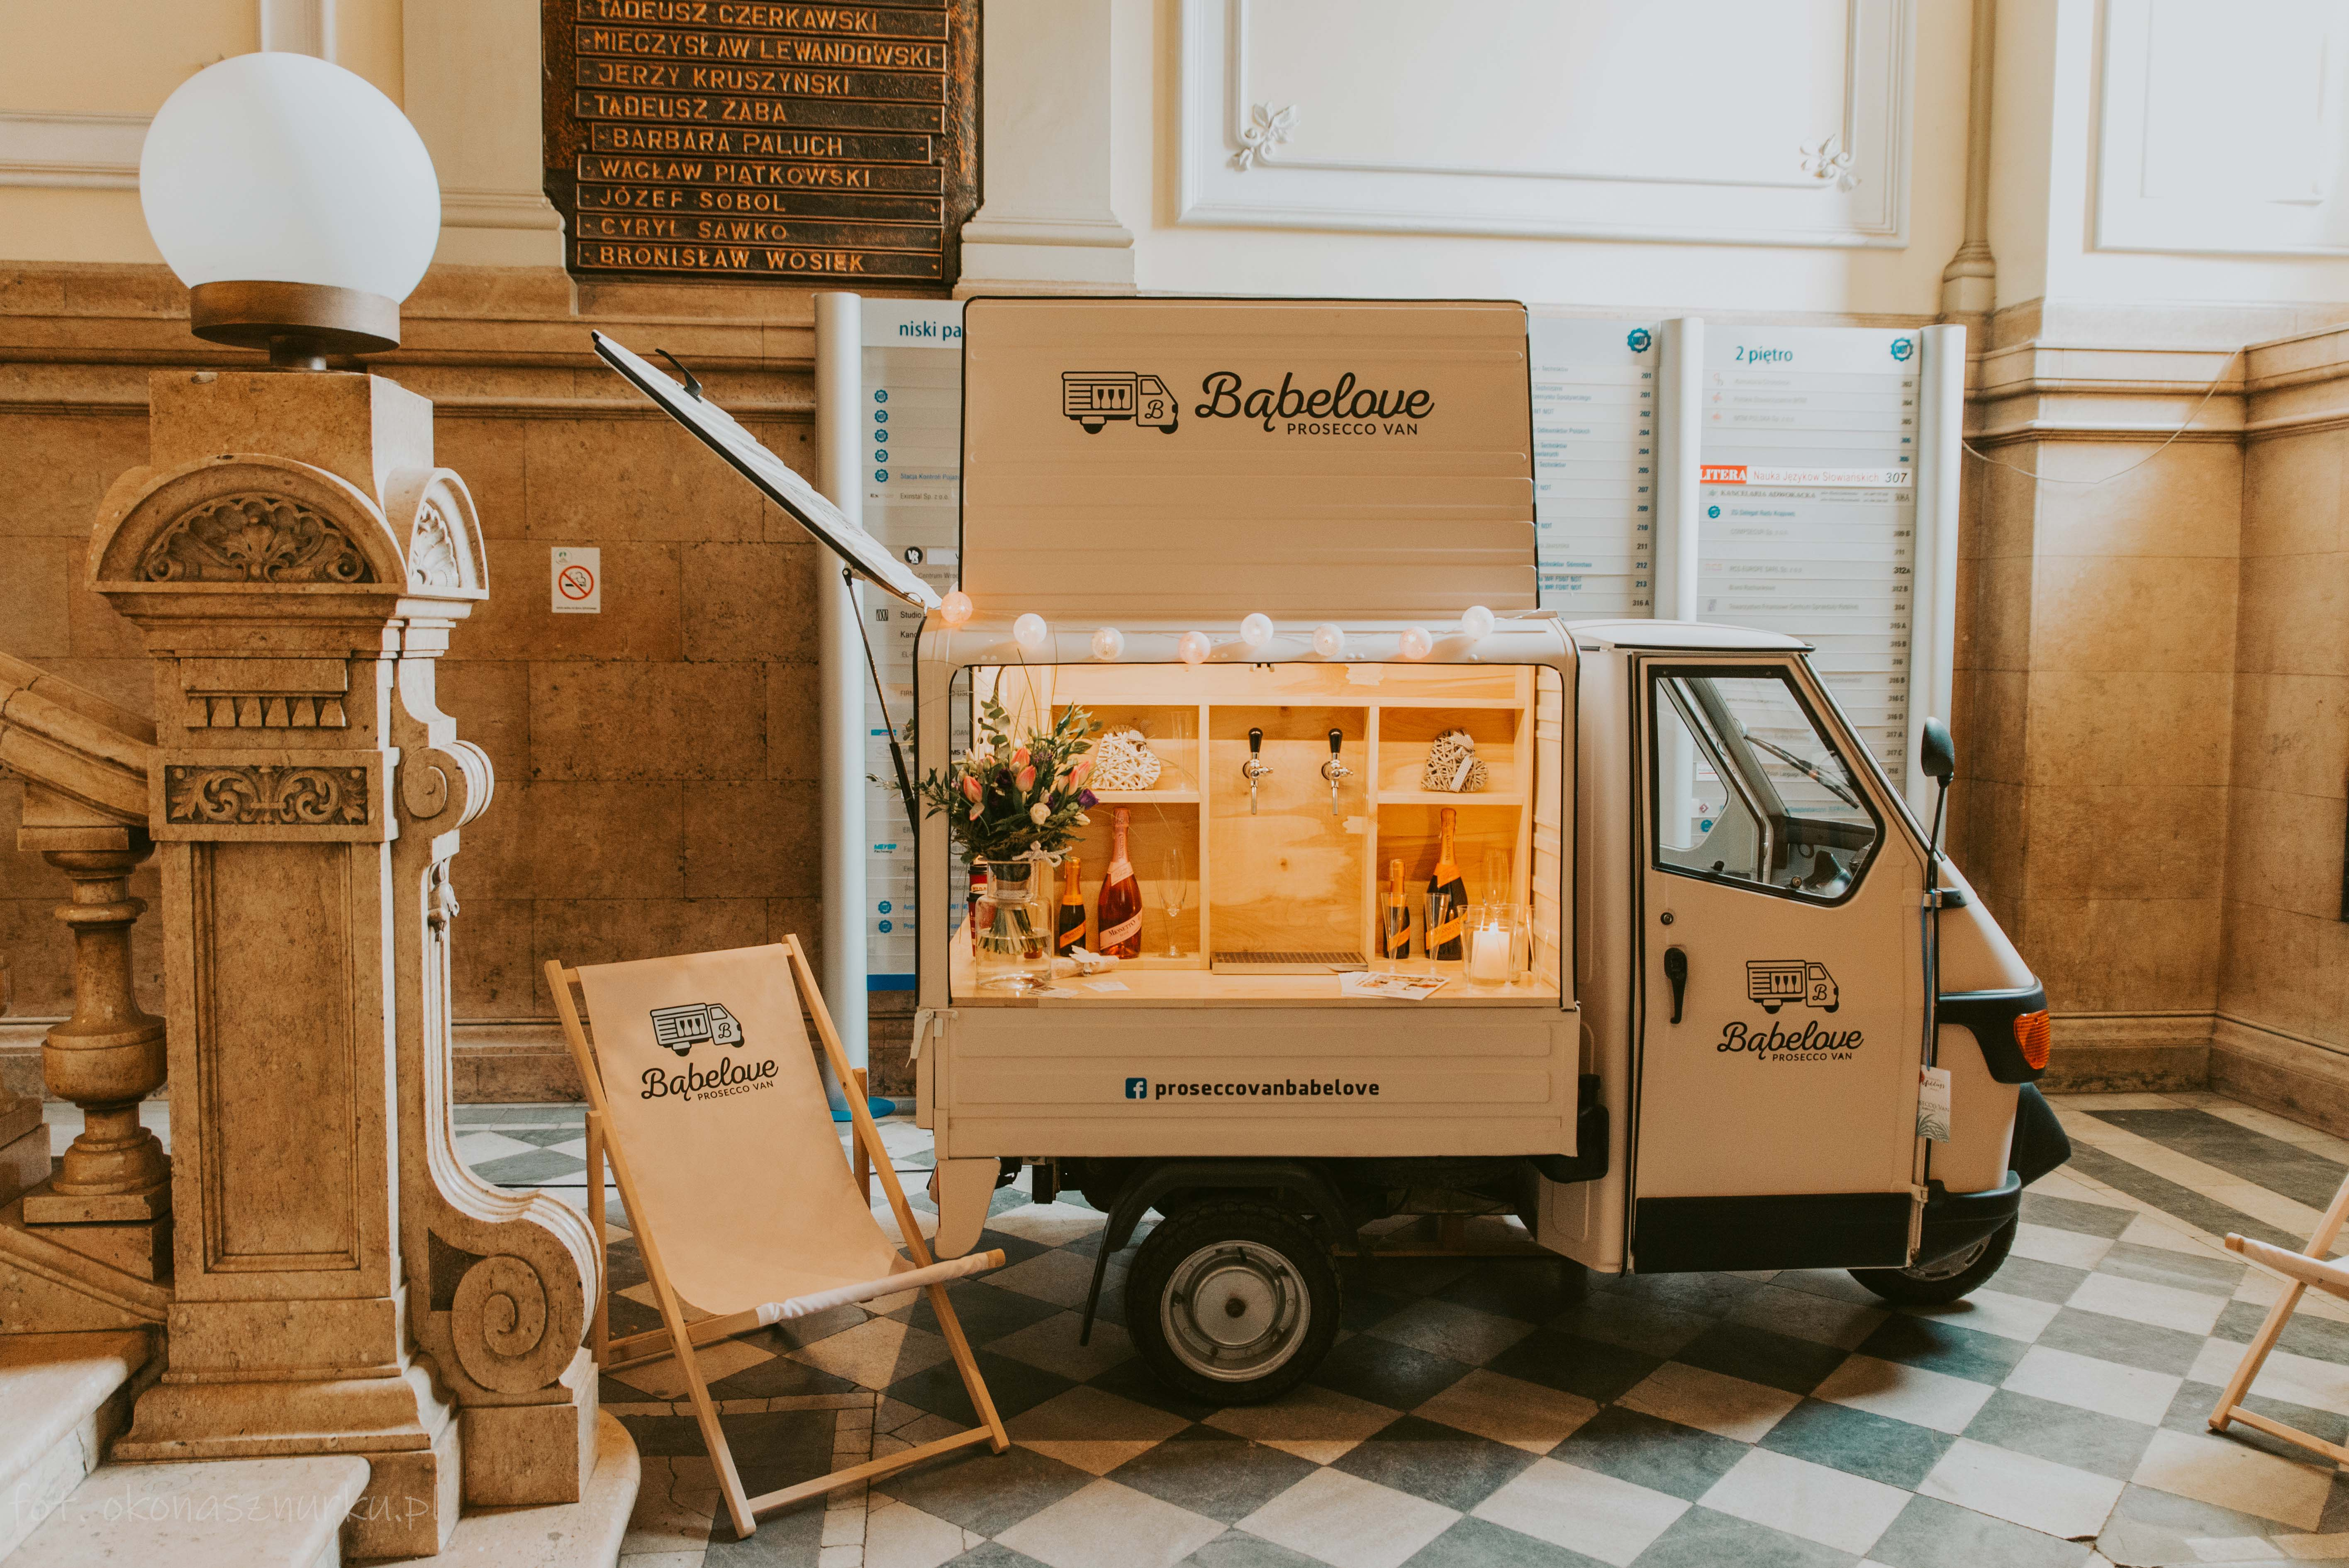 concept-weddings-okonasznurku-fotografia (28)